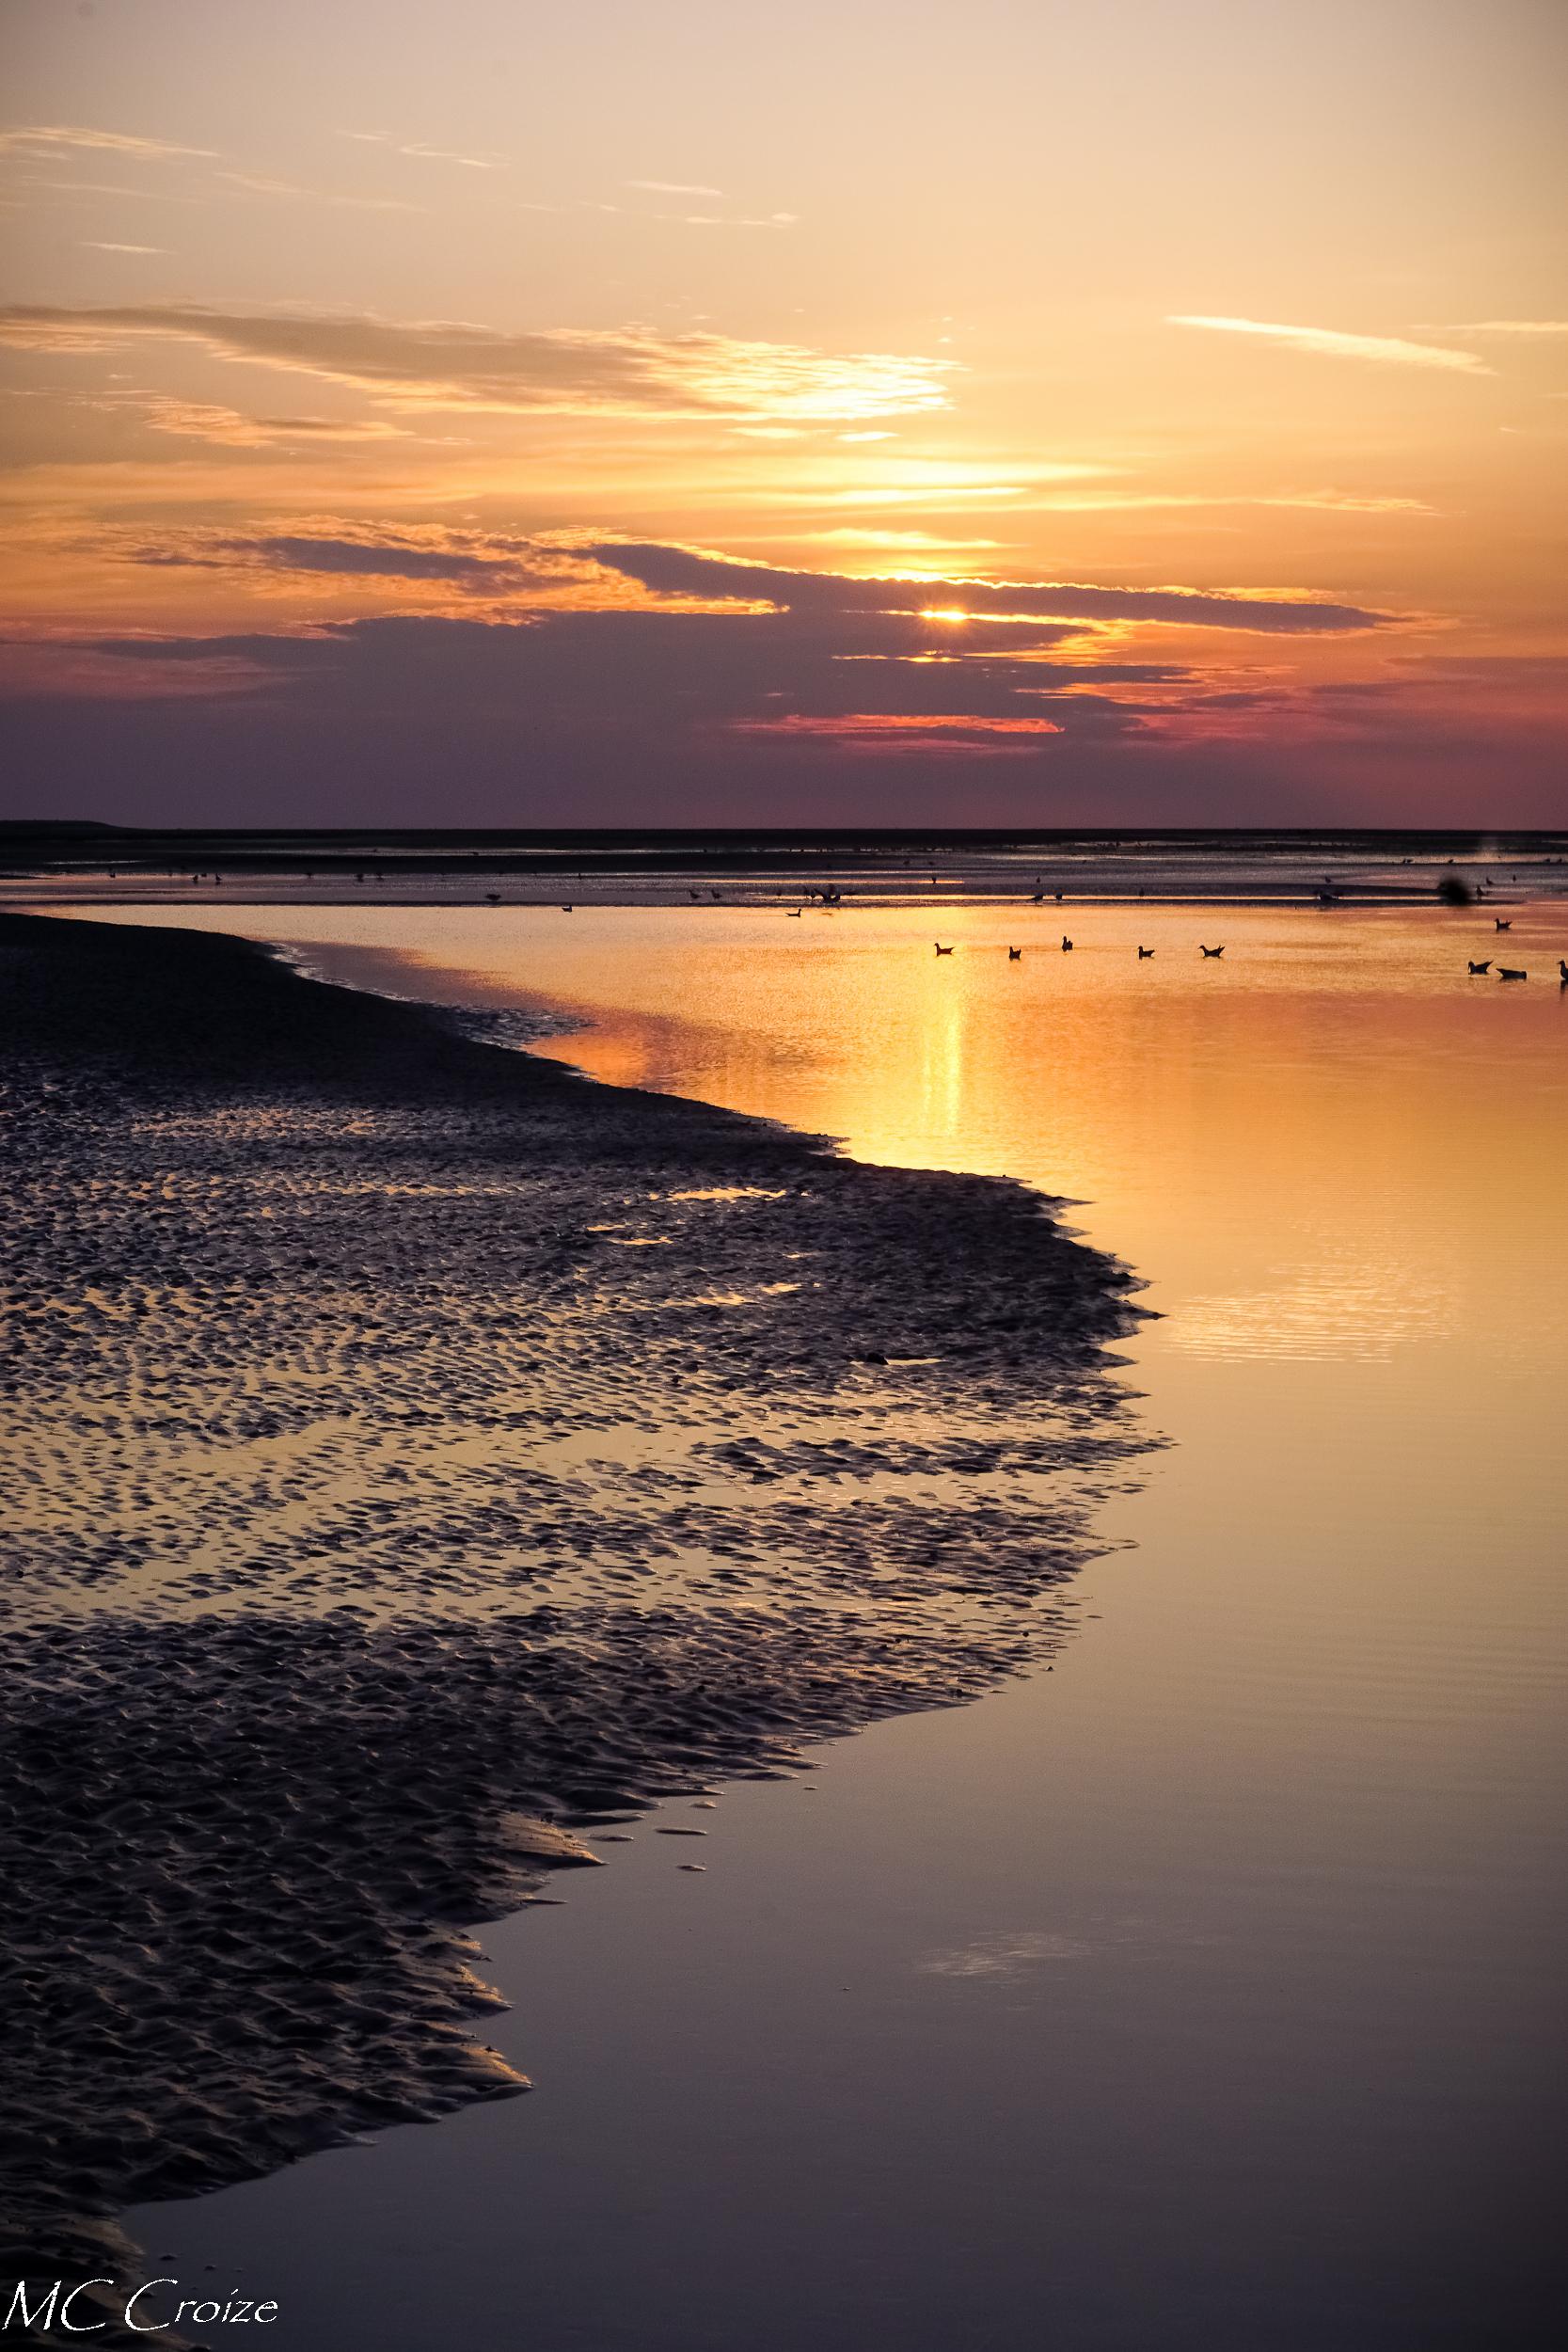 Sunset en baie de somme 30700792138_bc912543cb_o